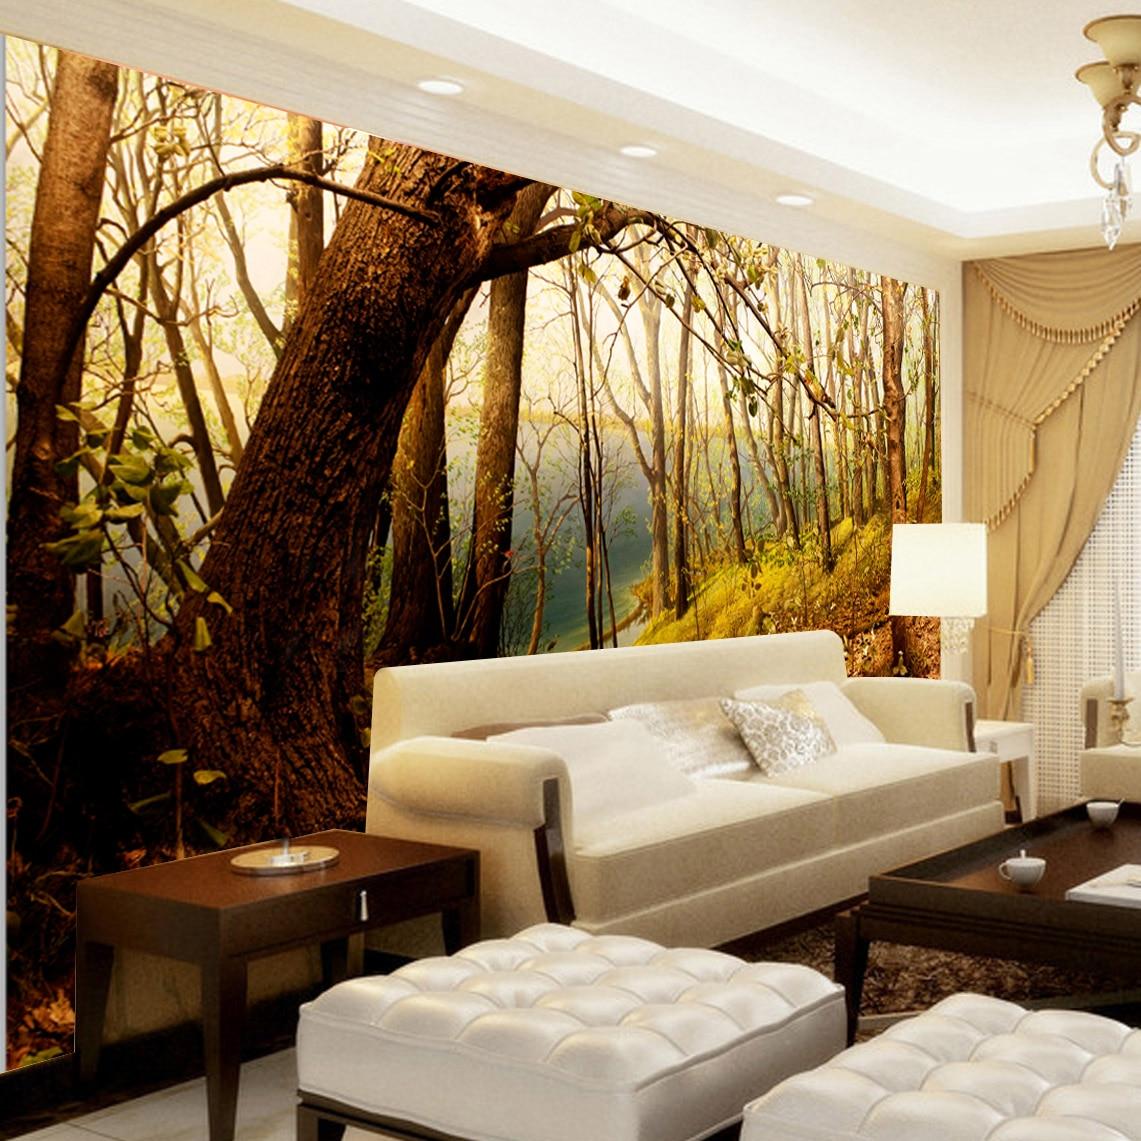 mural sofa murals living paper aliexpress walls fabric wholesale bedroom cafe landscape font fresco improvement salvato